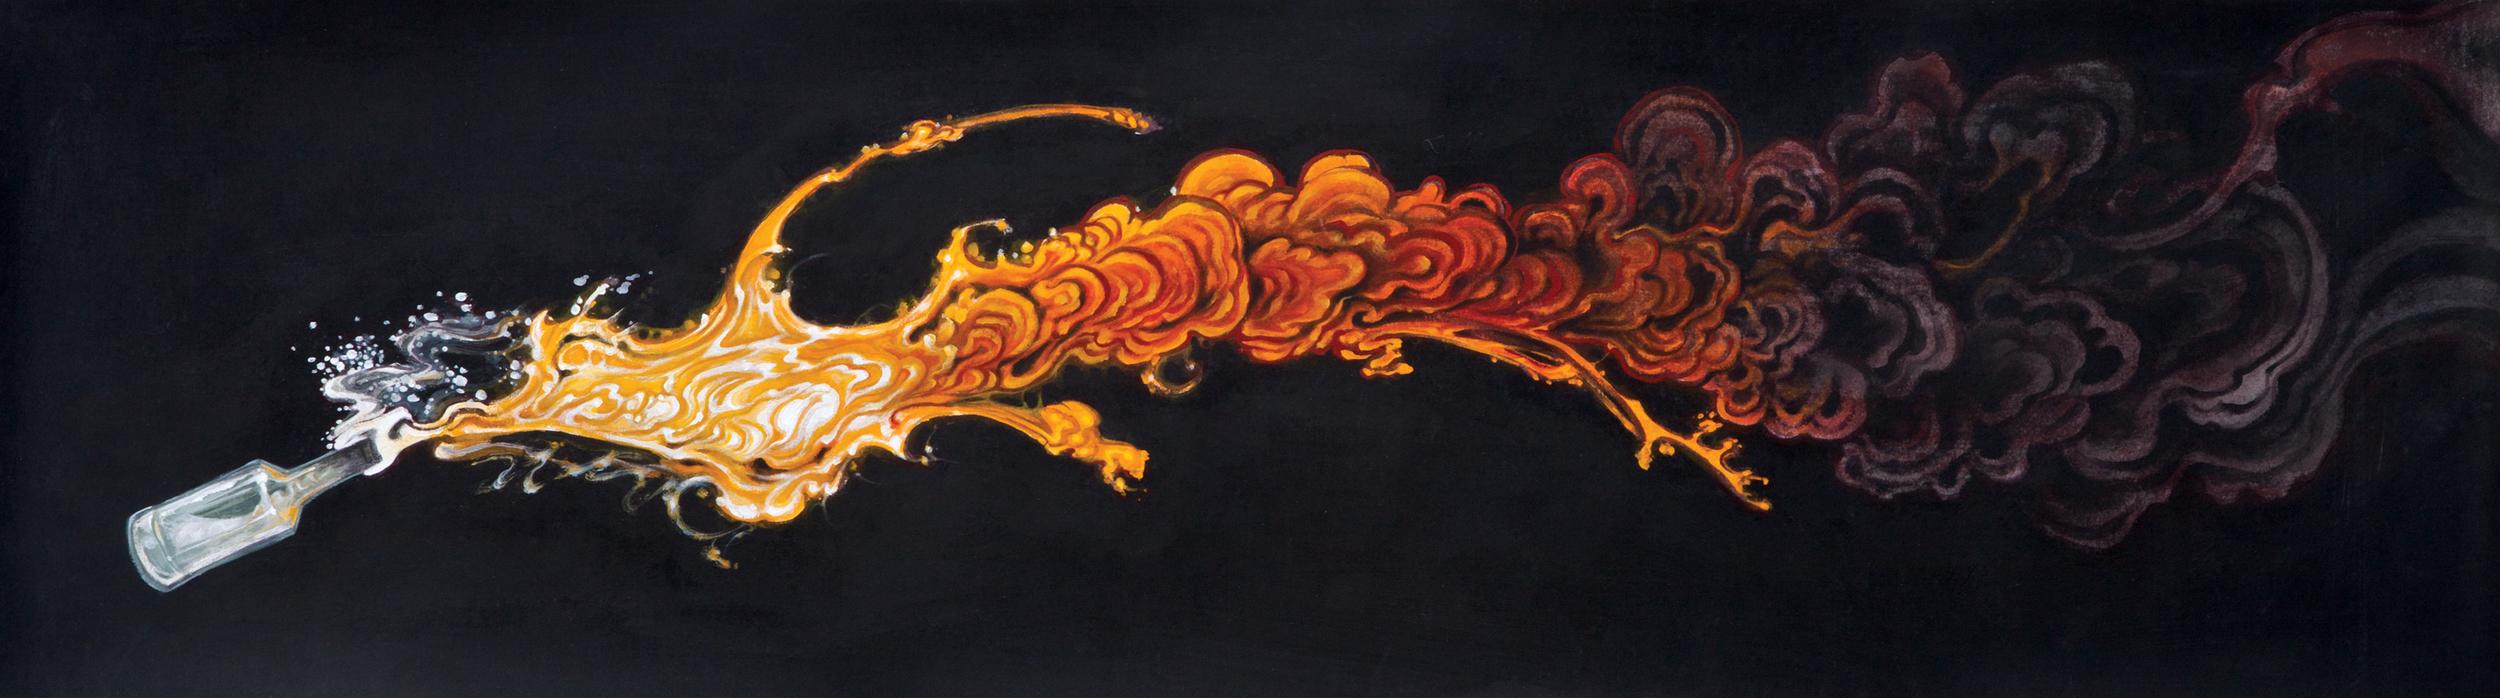 "Christopher Brand.  Molotov (All Involved) . 2015 - acrylic on fabric, 18"" x 60""."